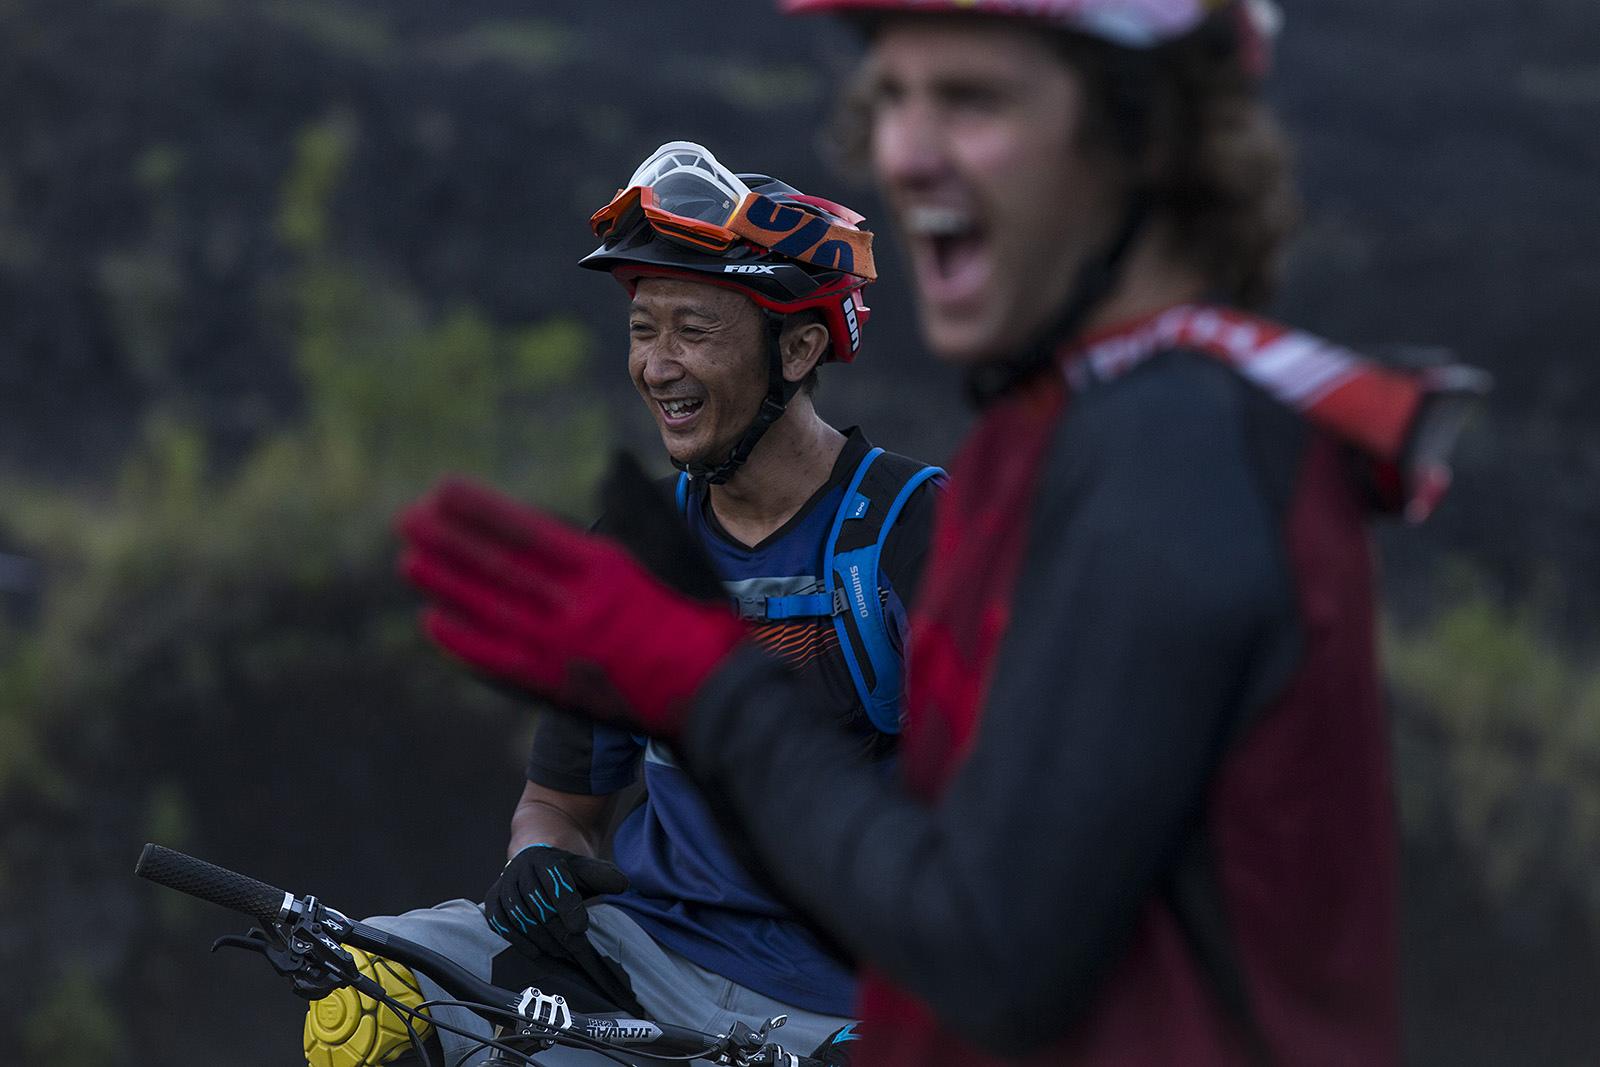 Cam McCaul with Rahmat Saefudin in Bali Indonesia